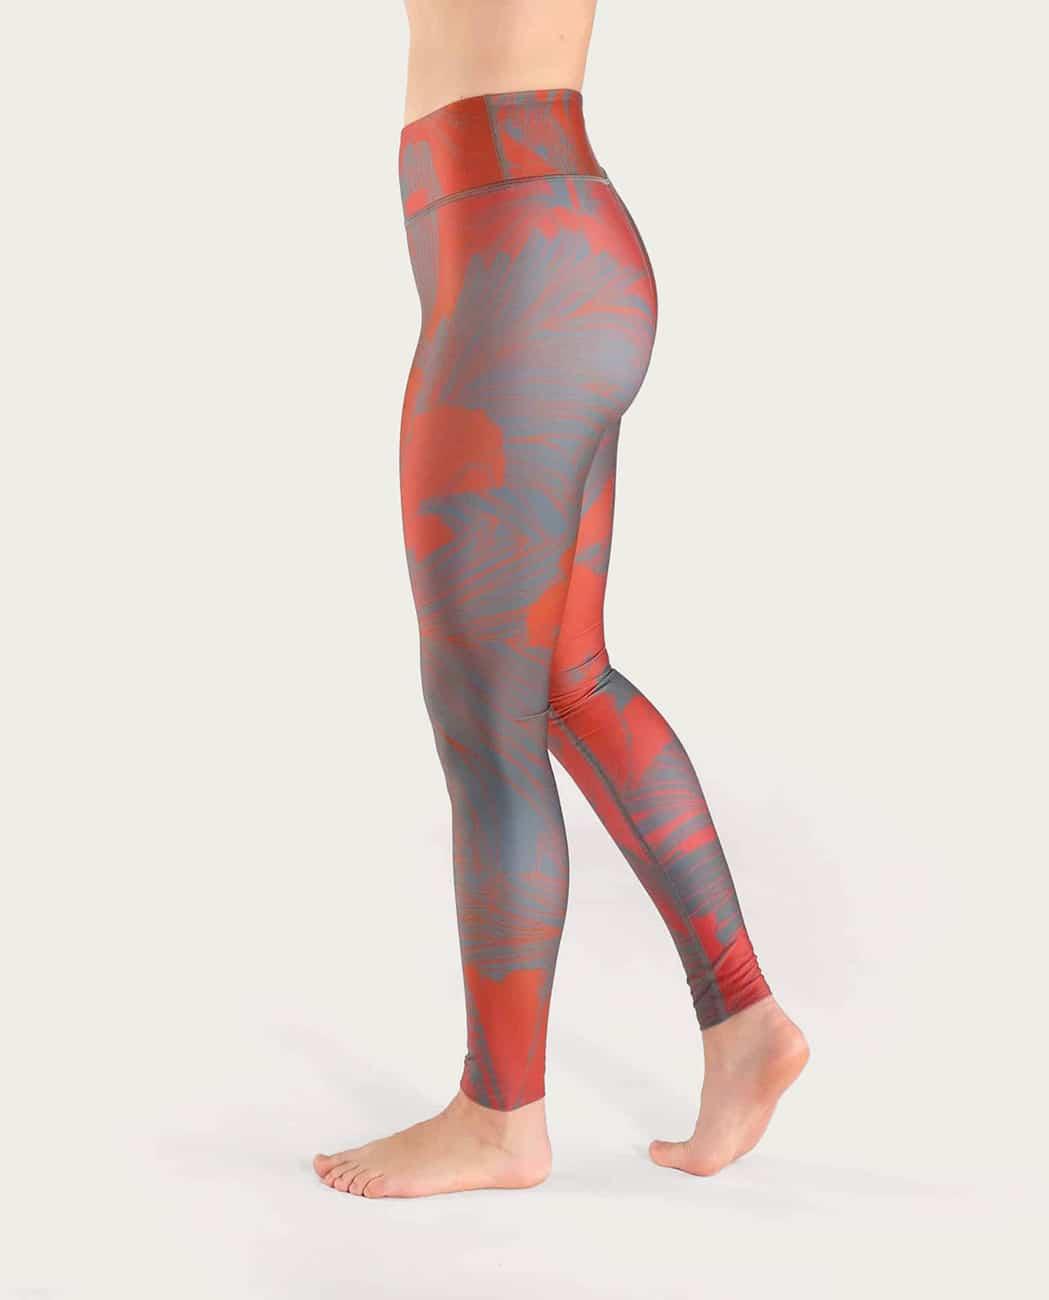 Hibiscus Yoga Leggings Komoshi Left